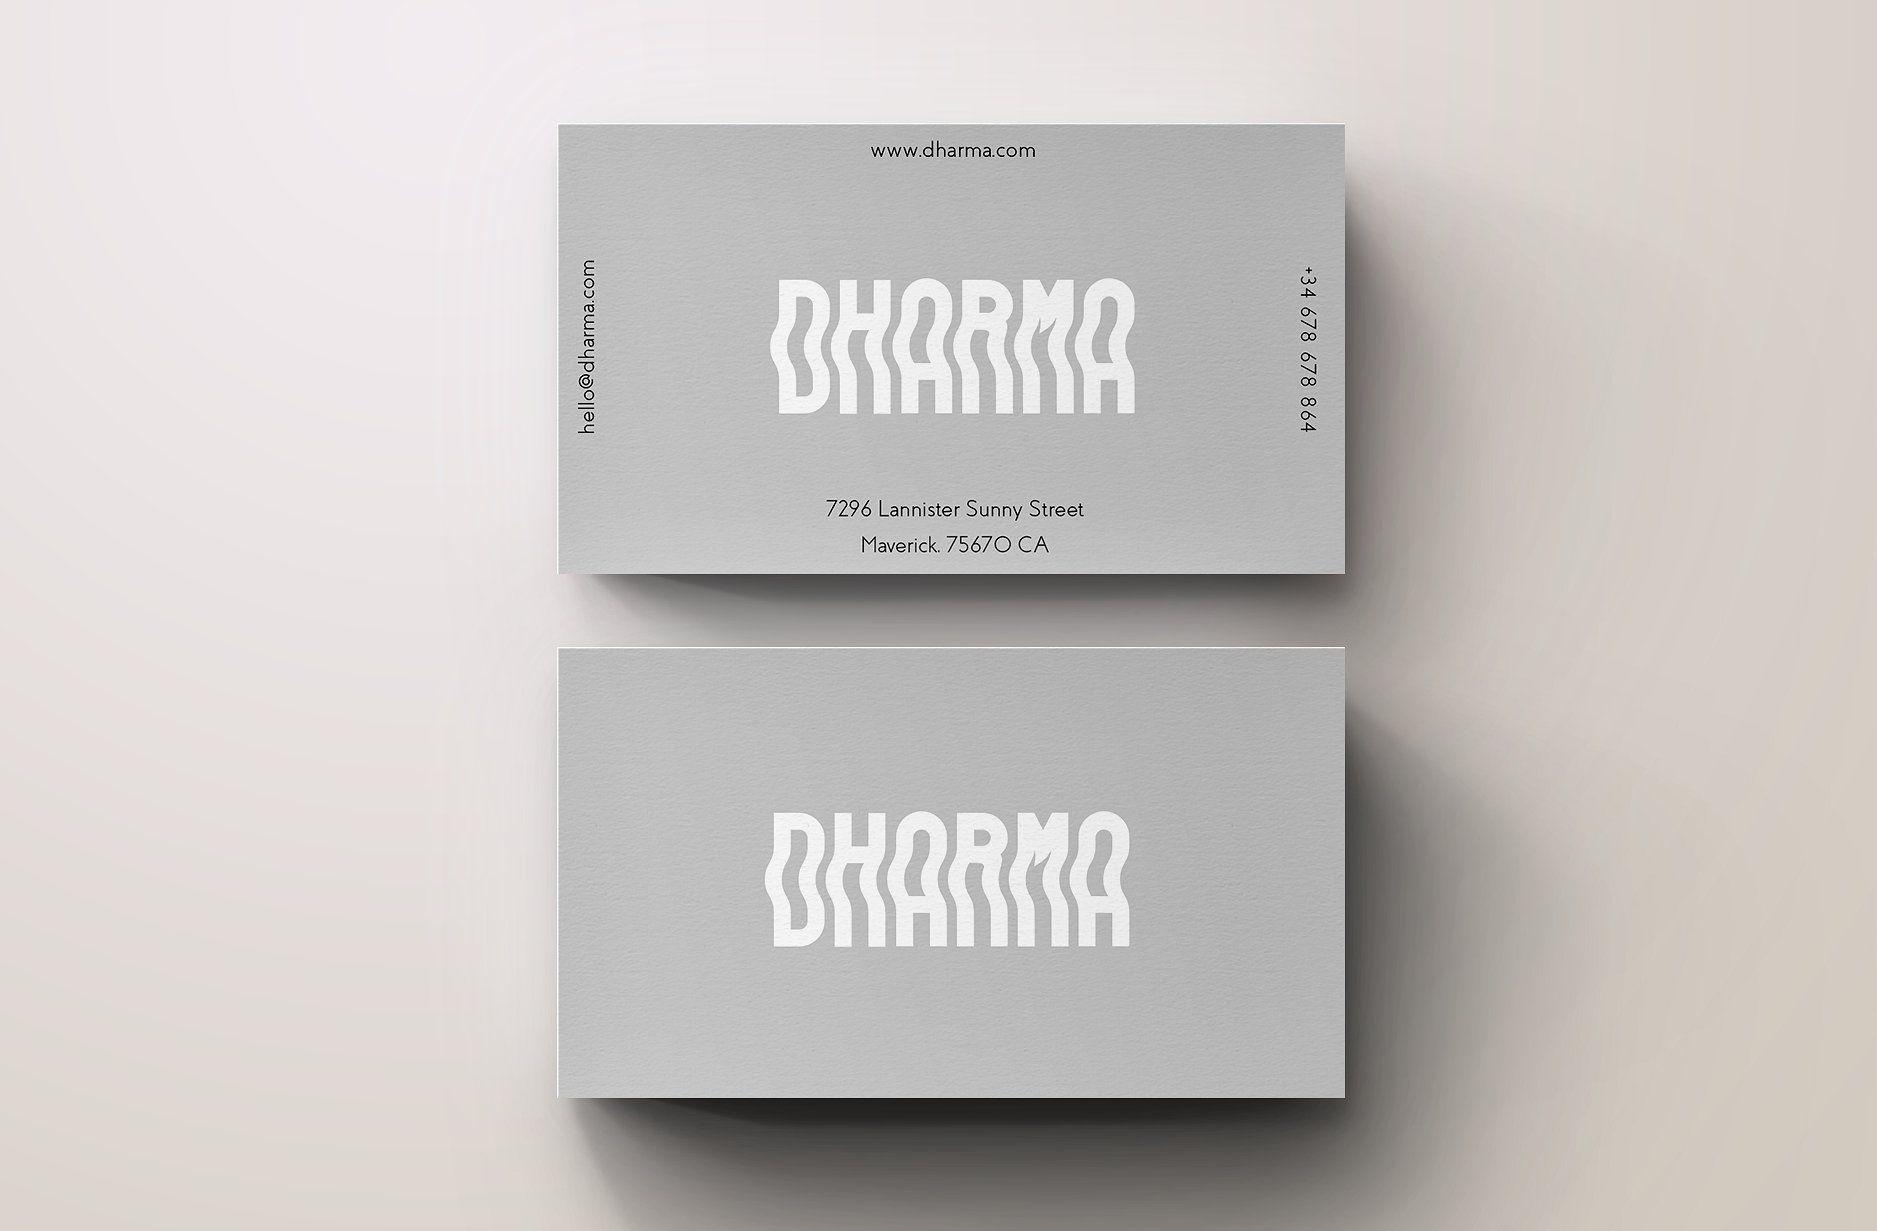 Dharma Modern Grey Business Card By Blank Studio On